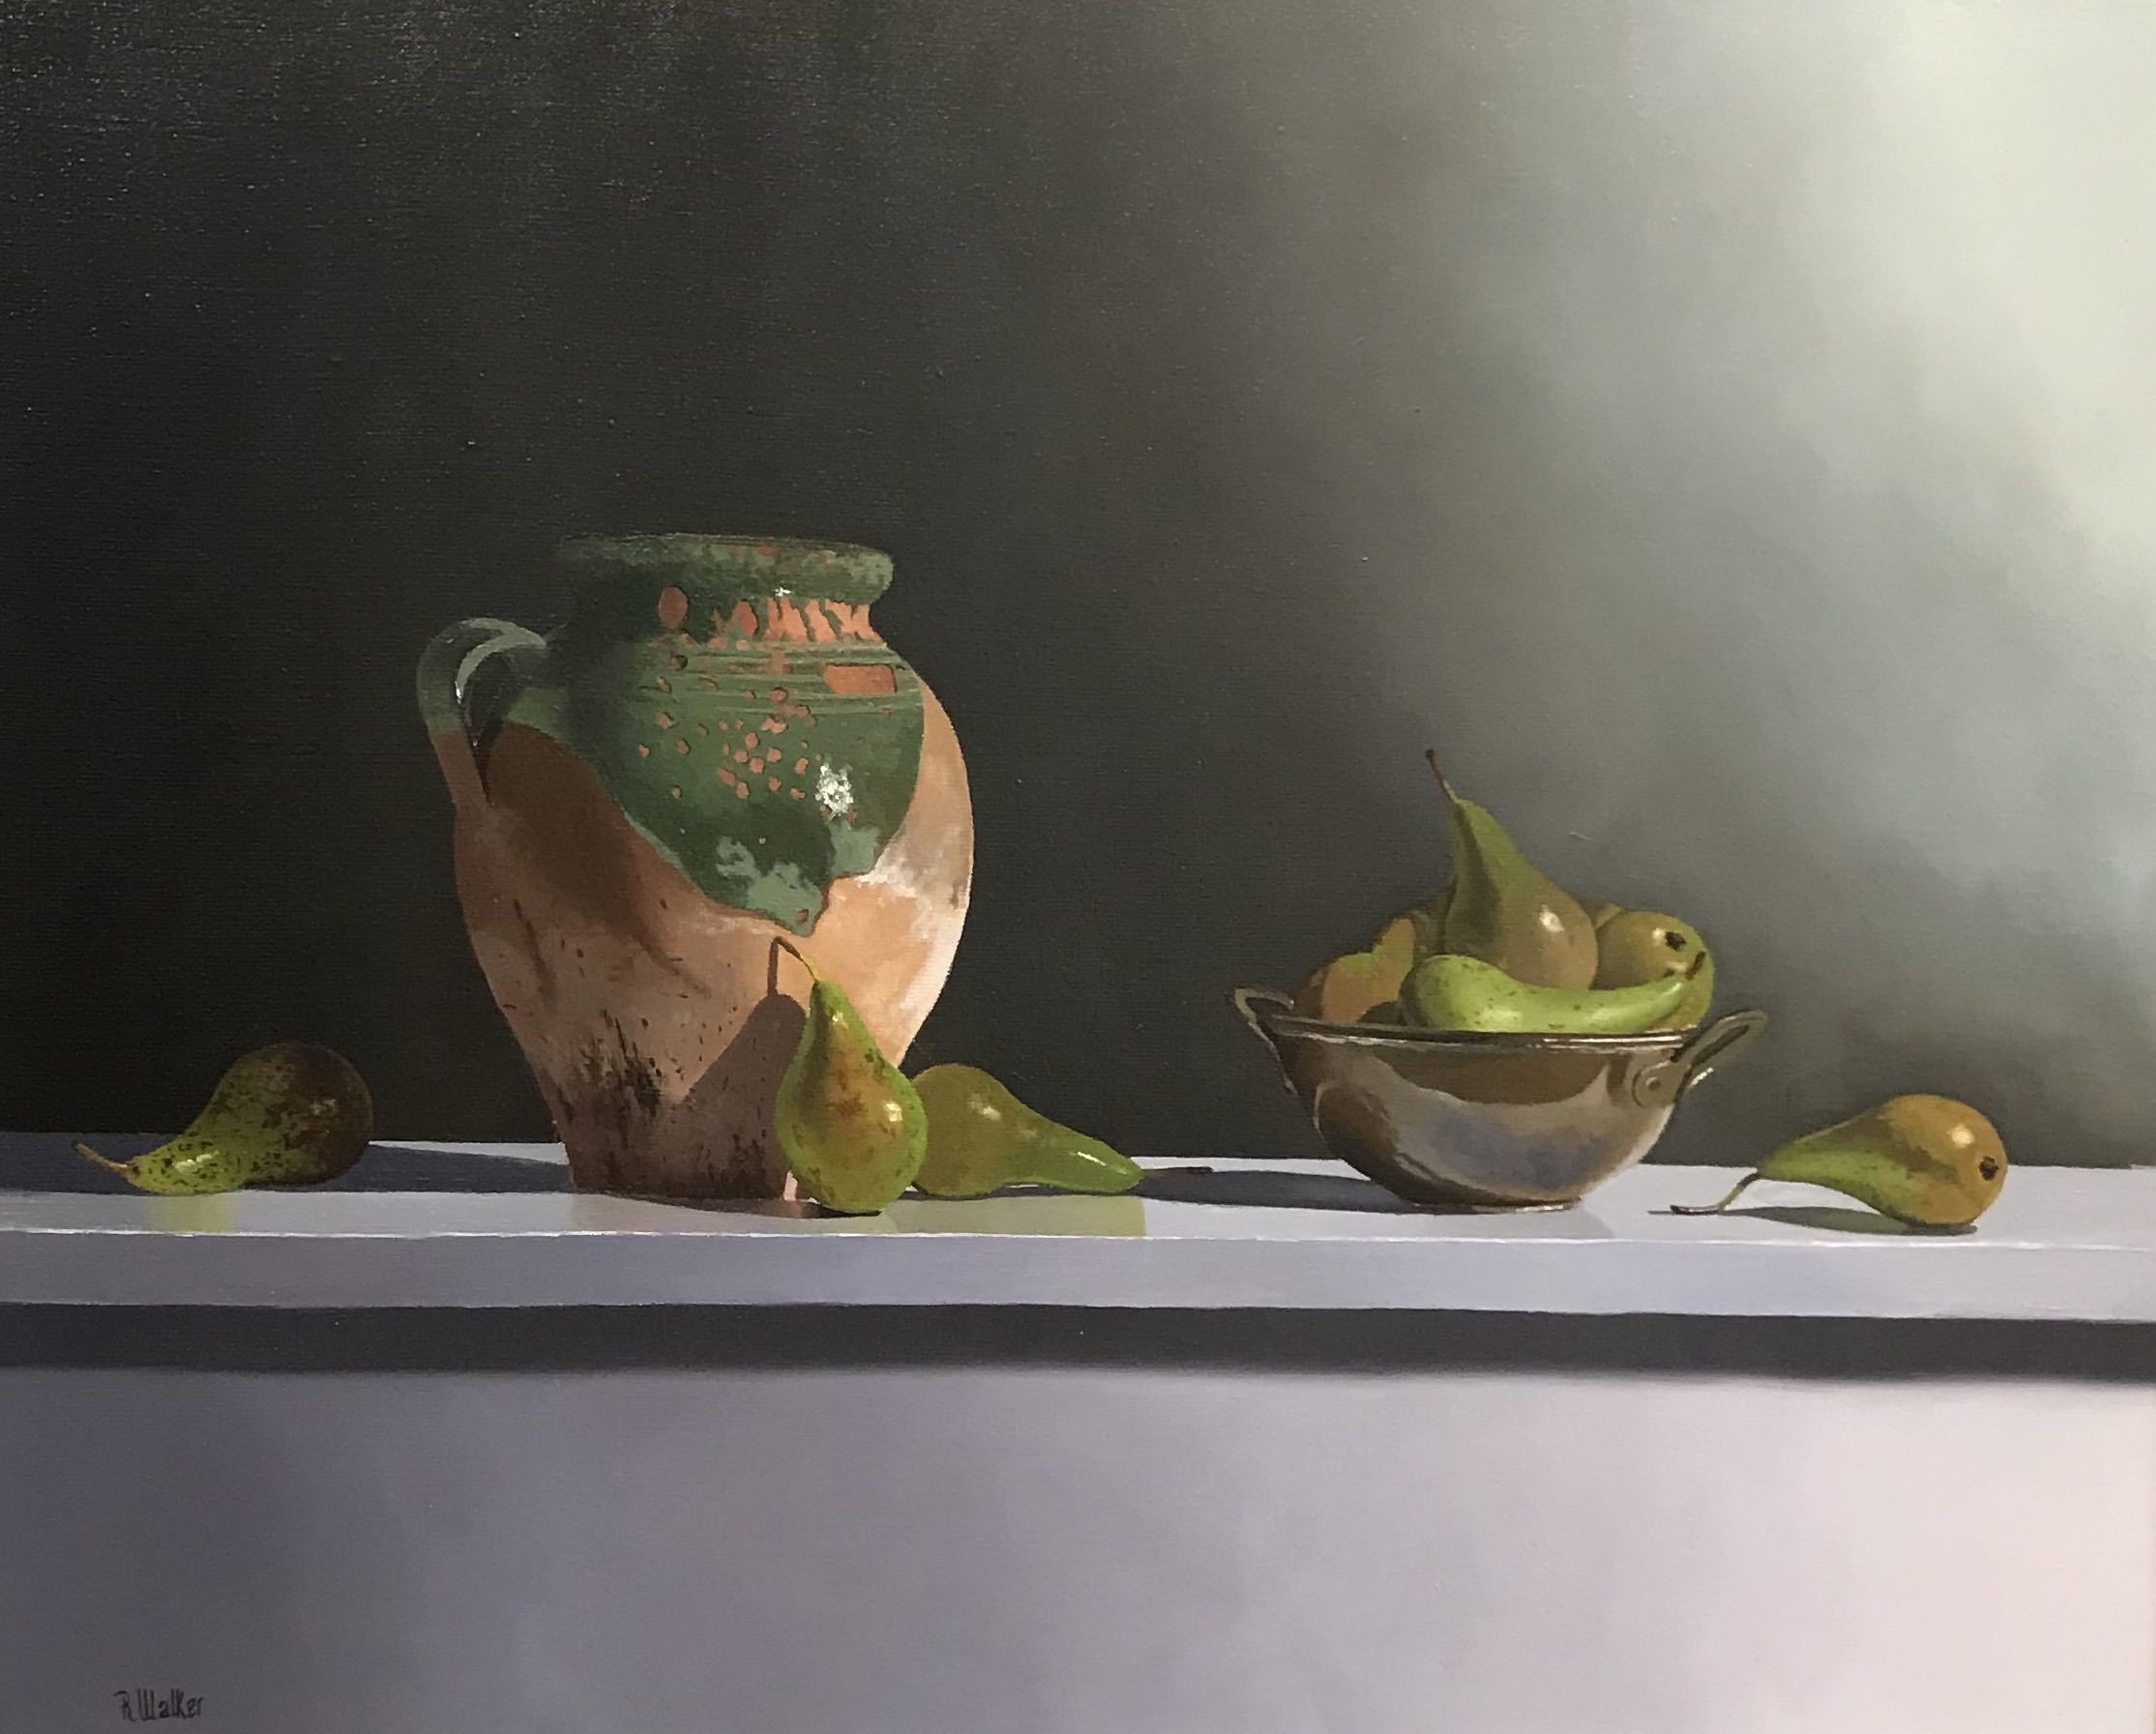 <span class=&#34;link fancybox-details-link&#34;><a href=&#34;/artists/67-robert-walker/works/2780-robert-walker-terracotta-pot-with-pears/&#34;>View Detail Page</a></span><div class=&#34;artist&#34;><strong>Robert Walker</strong></div> <div class=&#34;title&#34;><em>Terracotta Pot with Pears</em></div> <div class=&#34;medium&#34;>Oil on Linen</div> <div class=&#34;dimensions&#34;>66 x 81 cm </div><div class=&#34;price&#34;>£1,900.00</div><div class=&#34;copyright_line&#34;>Copyright The Artist</div>